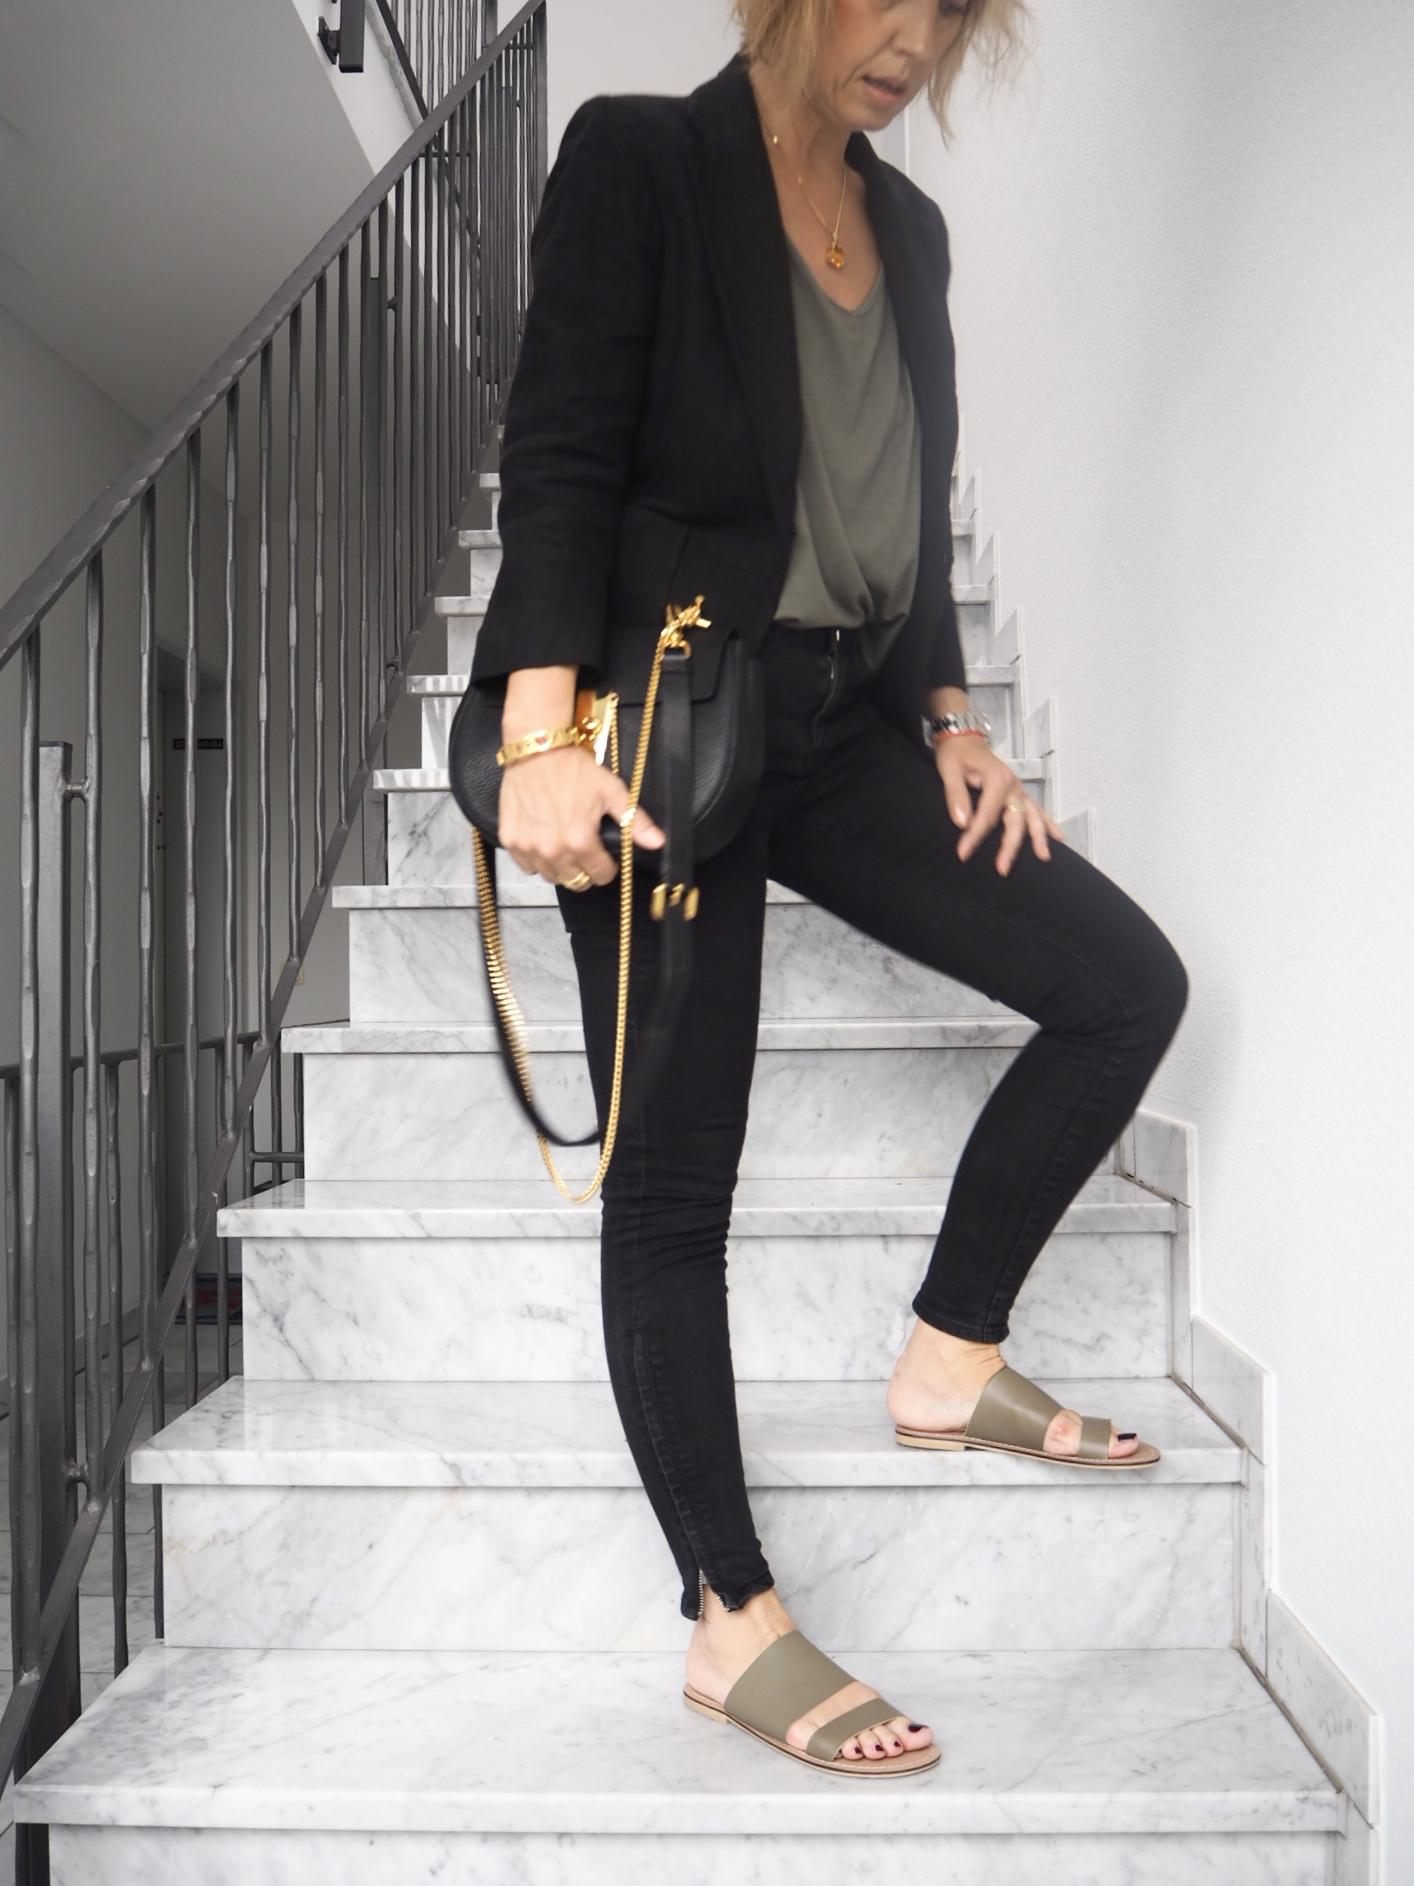 Khaki Afterwork Outfit